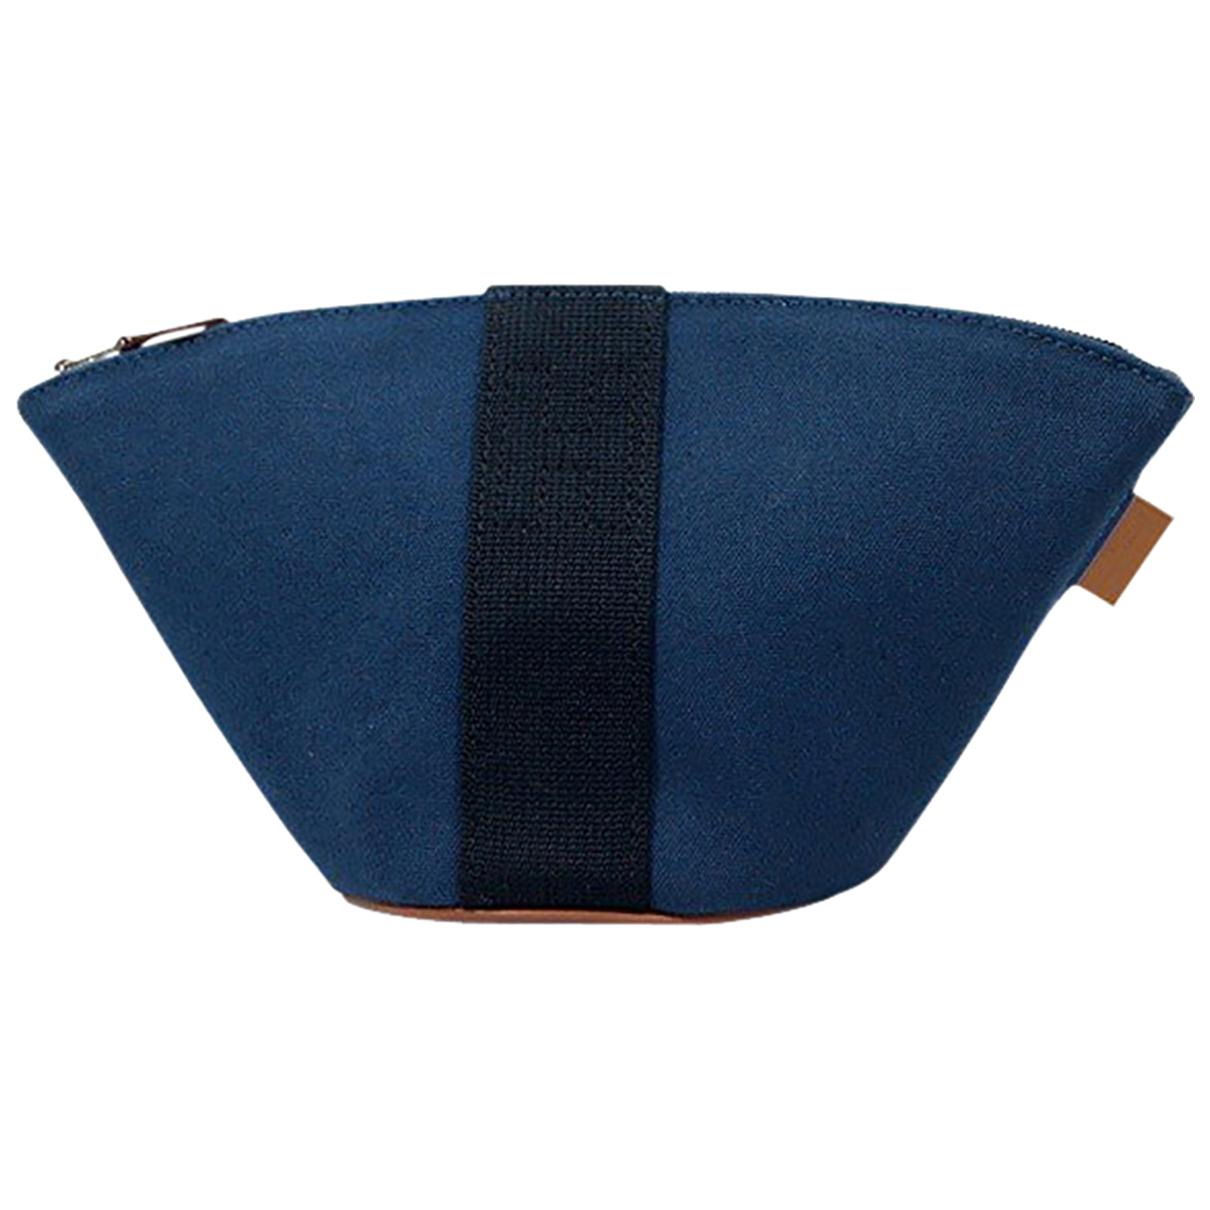 Hermès \N Blue Cotton Travel bag for Women \N